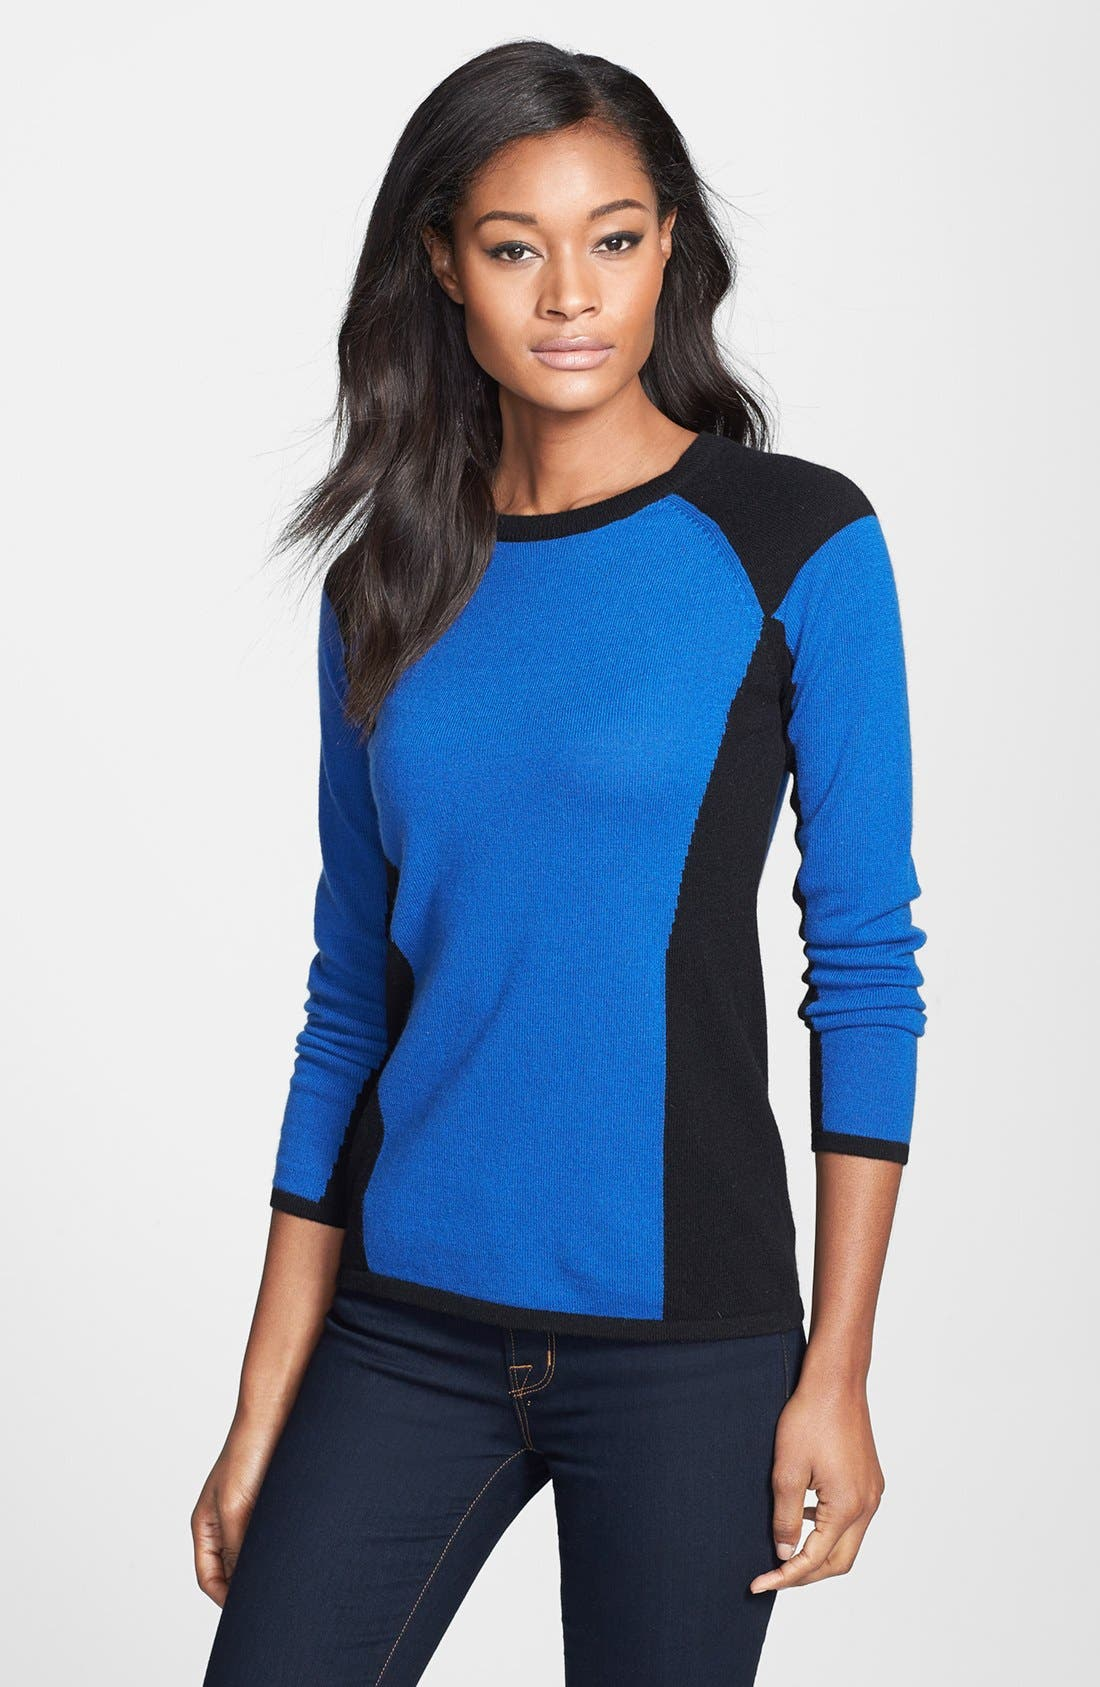 Alternate Image 1 Selected - Lauren Hansen Colorblock Cashmere Pullover